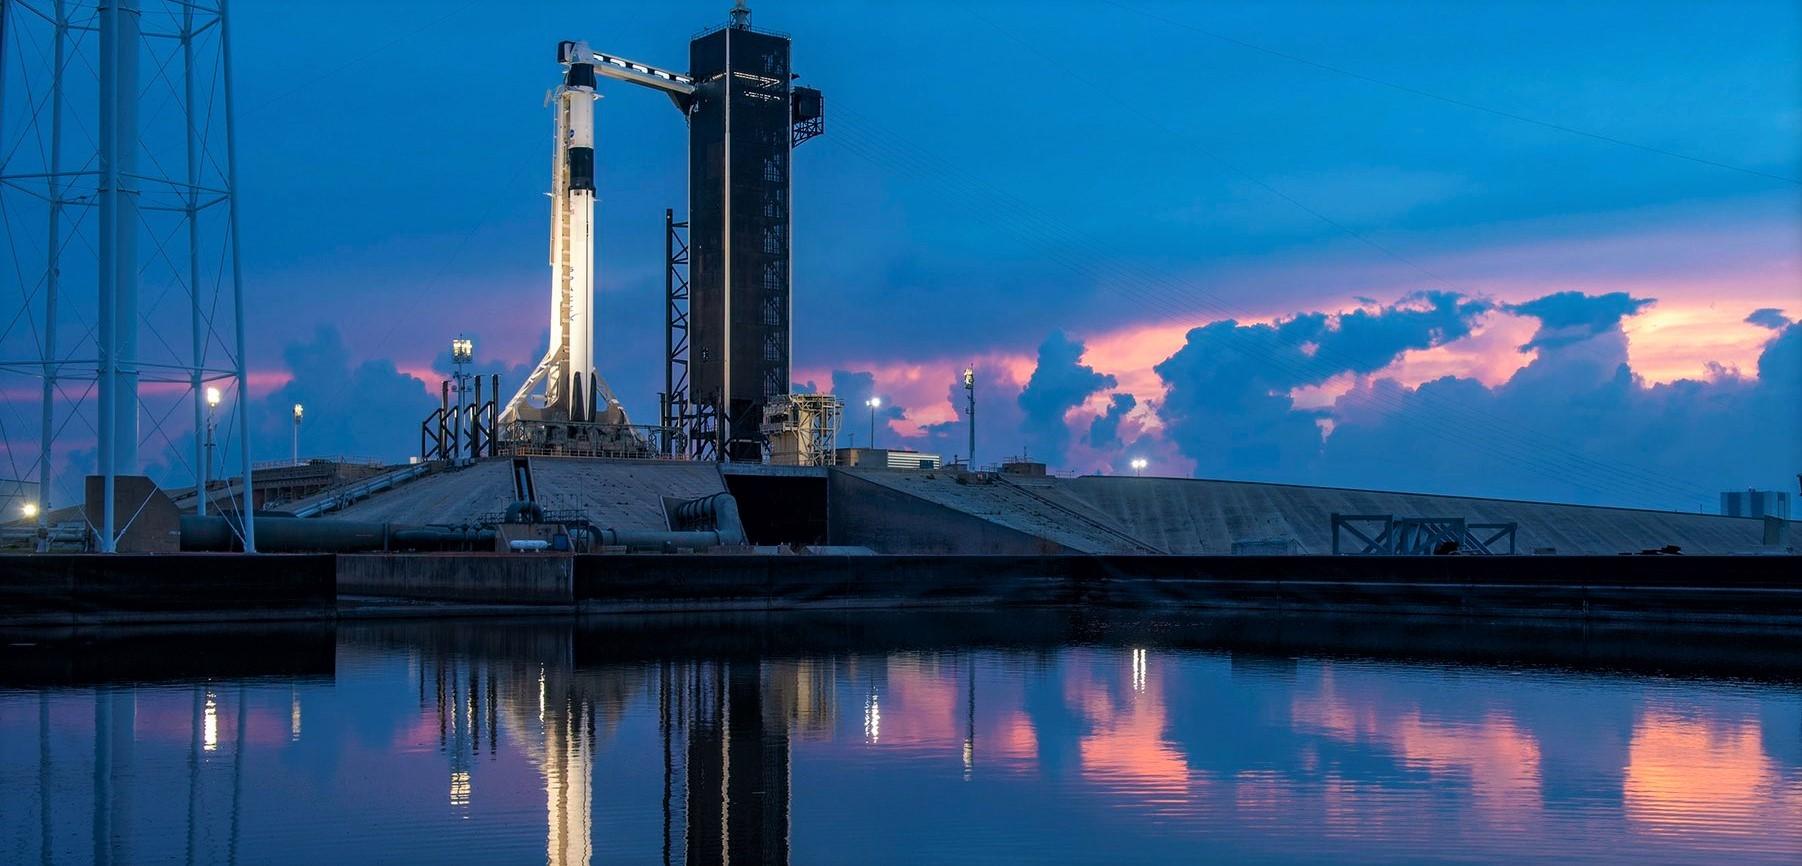 https://www.teslarati.com/wp-content/uploads/2020/05/Crew-Dragon-C206-F9-B1058-Demo-2-39A-052620-SpaceX-1-crop.jpg